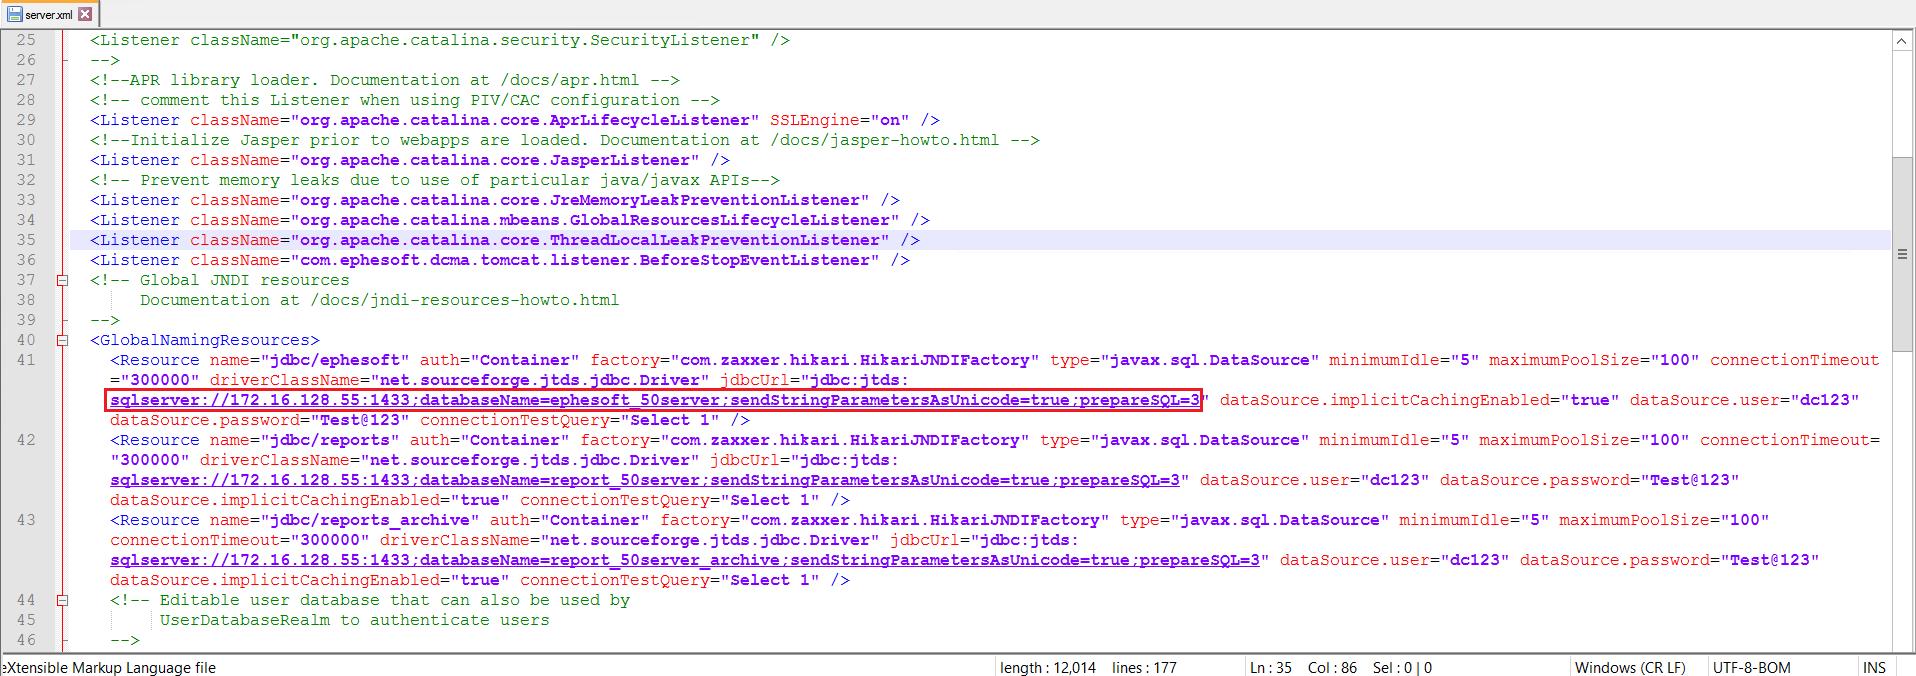 C:\Users\Ephesoft\AppData\Local\Microsoft\Windows\INetCache\Content.Word\server.xml-original.png